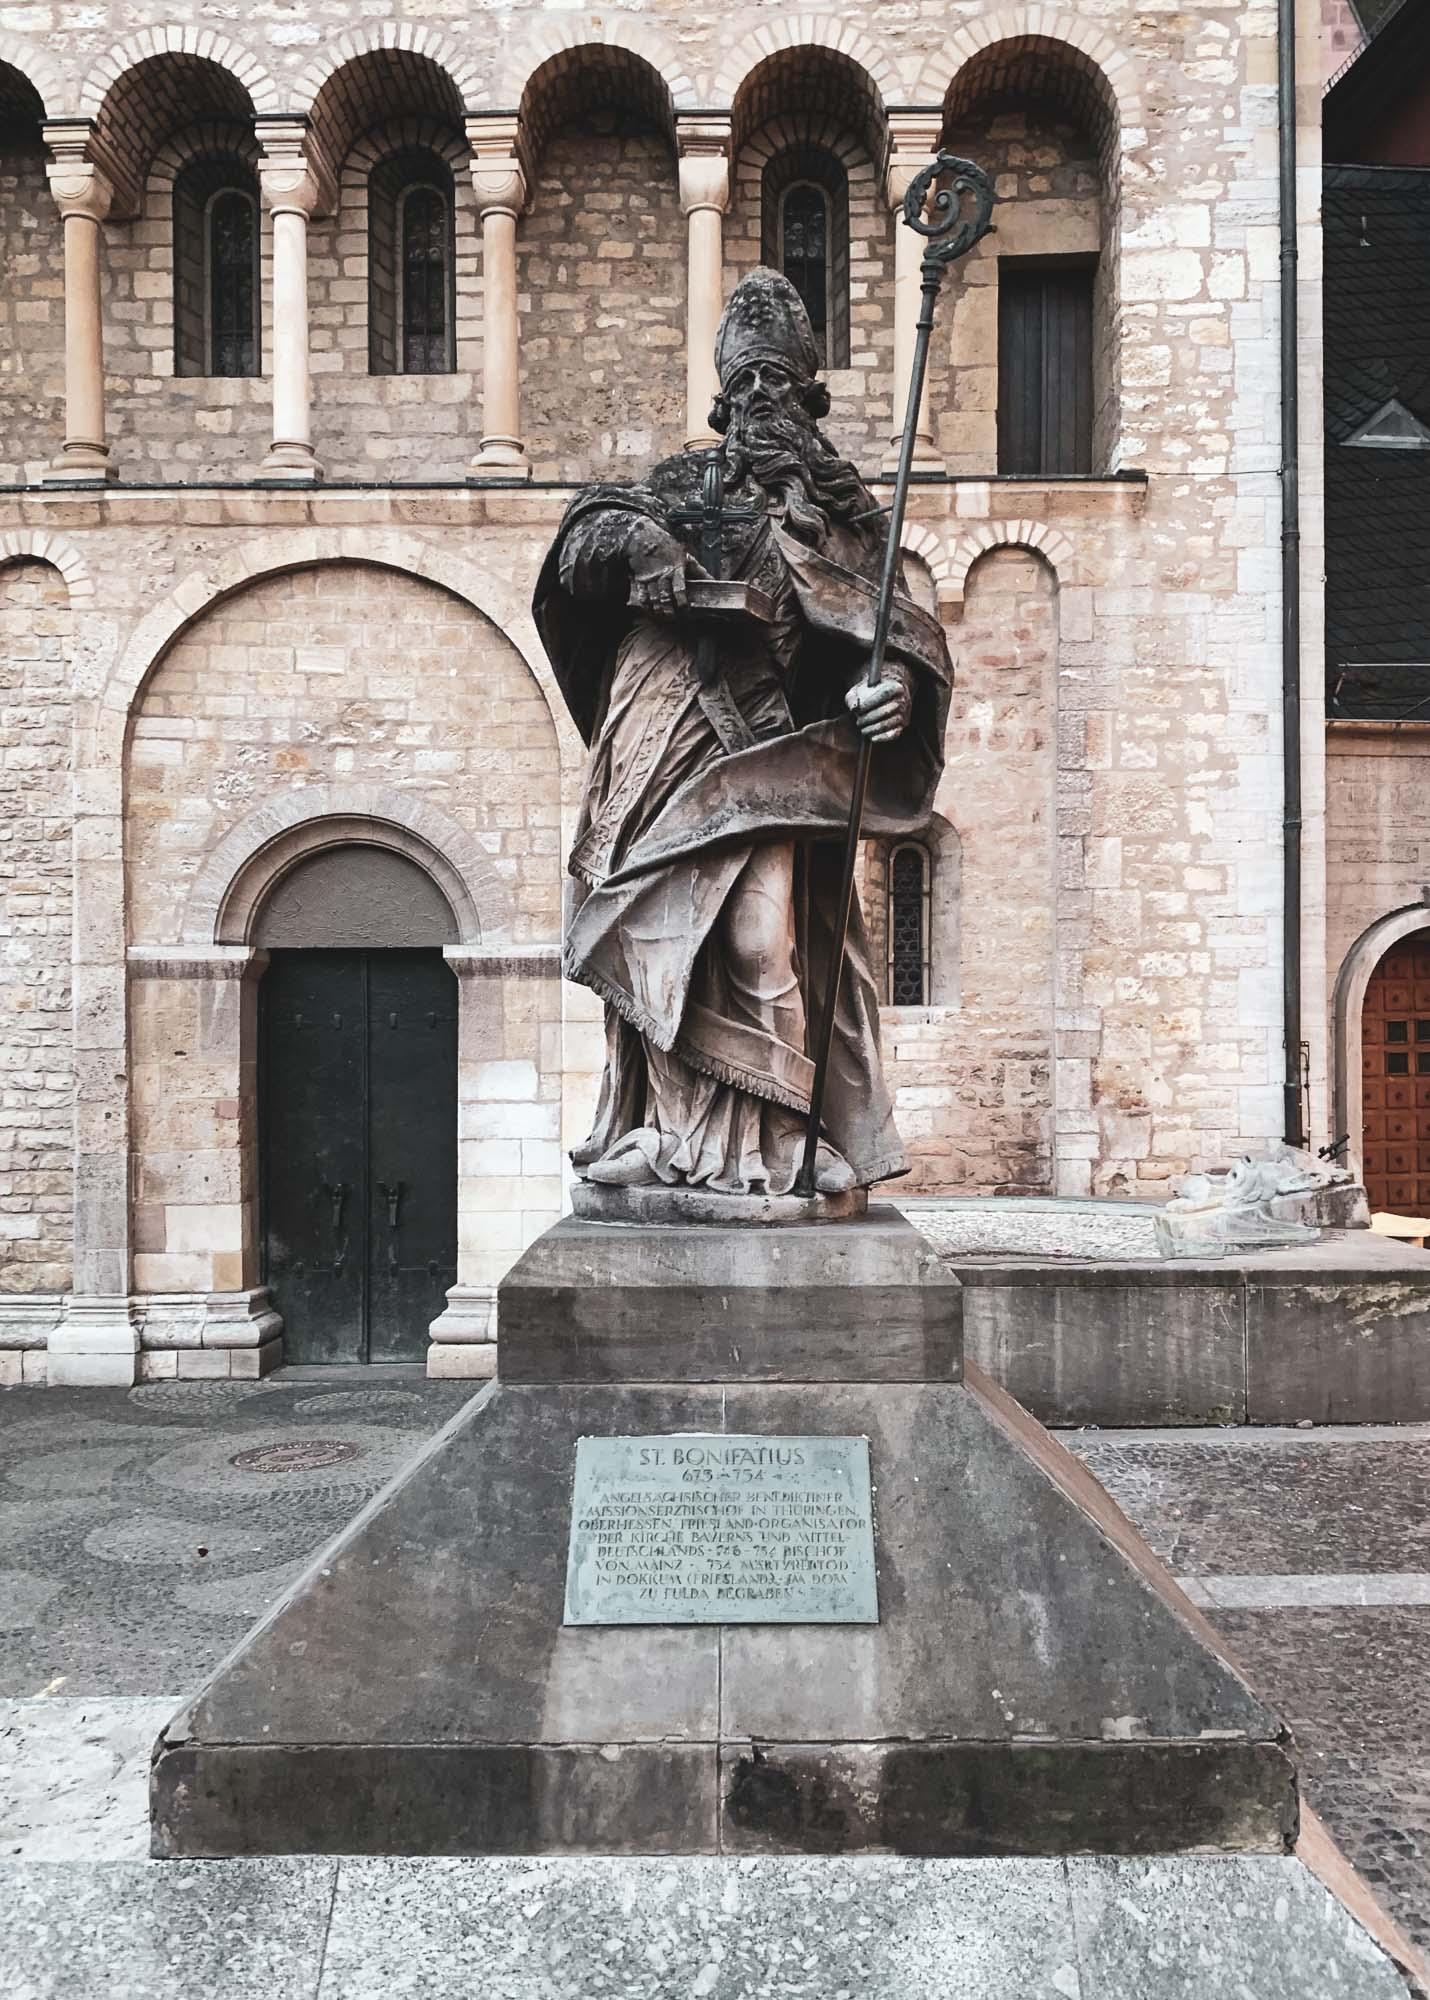 St Bonifatius